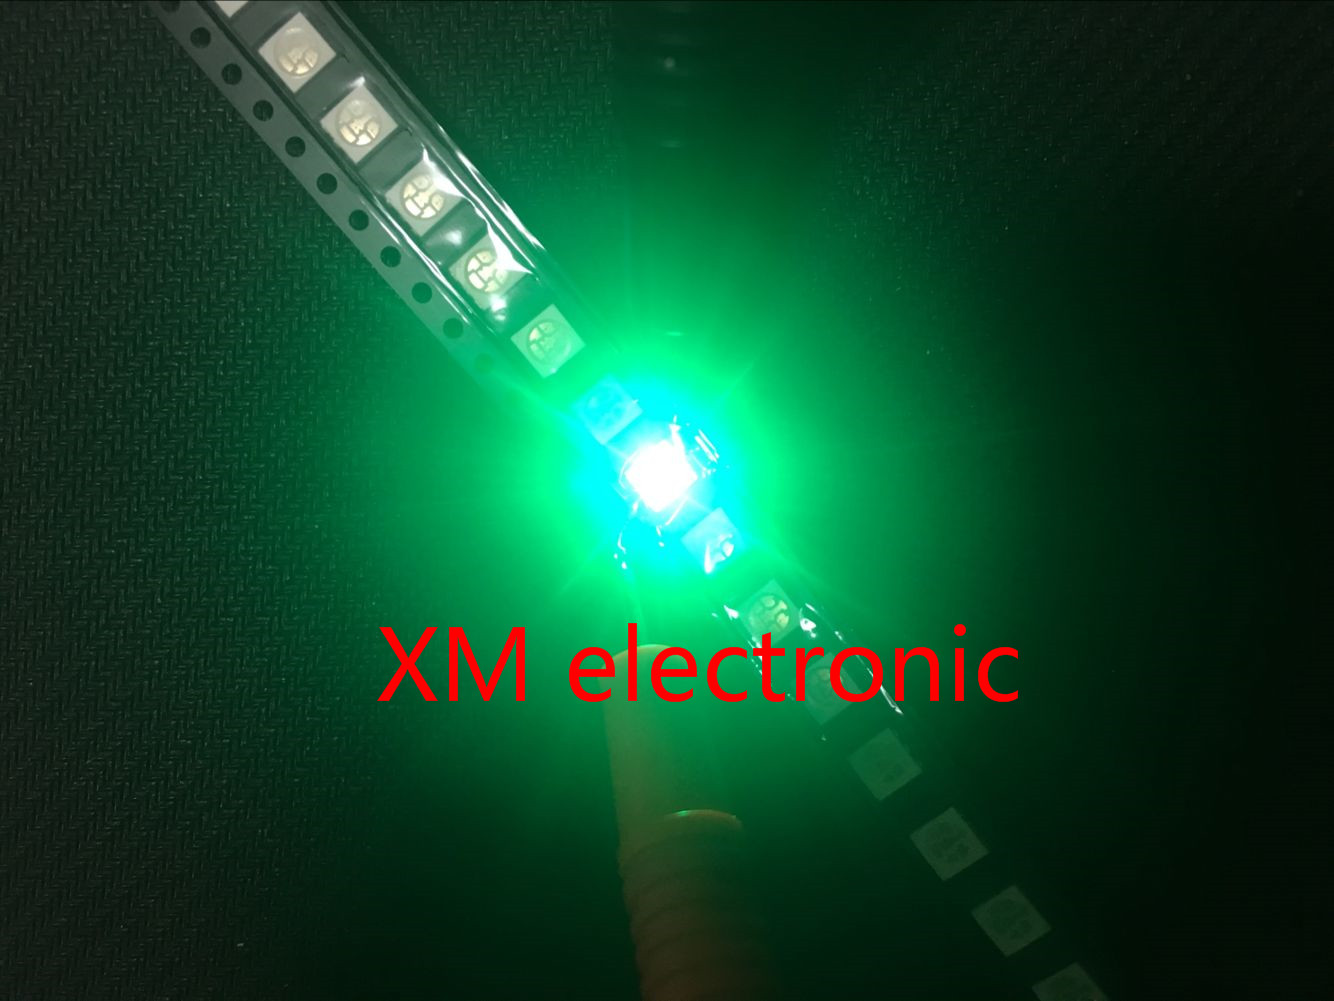 200pcs 5050 SMD Green PLCC-6 3-CHIPS 9000 <font><b>MCD</b></font> Ultra Bright <font><b>LED</b></font> High quality light-emitting diodes 5050 Green <font><b>LED</b></font> 5050 Diodes